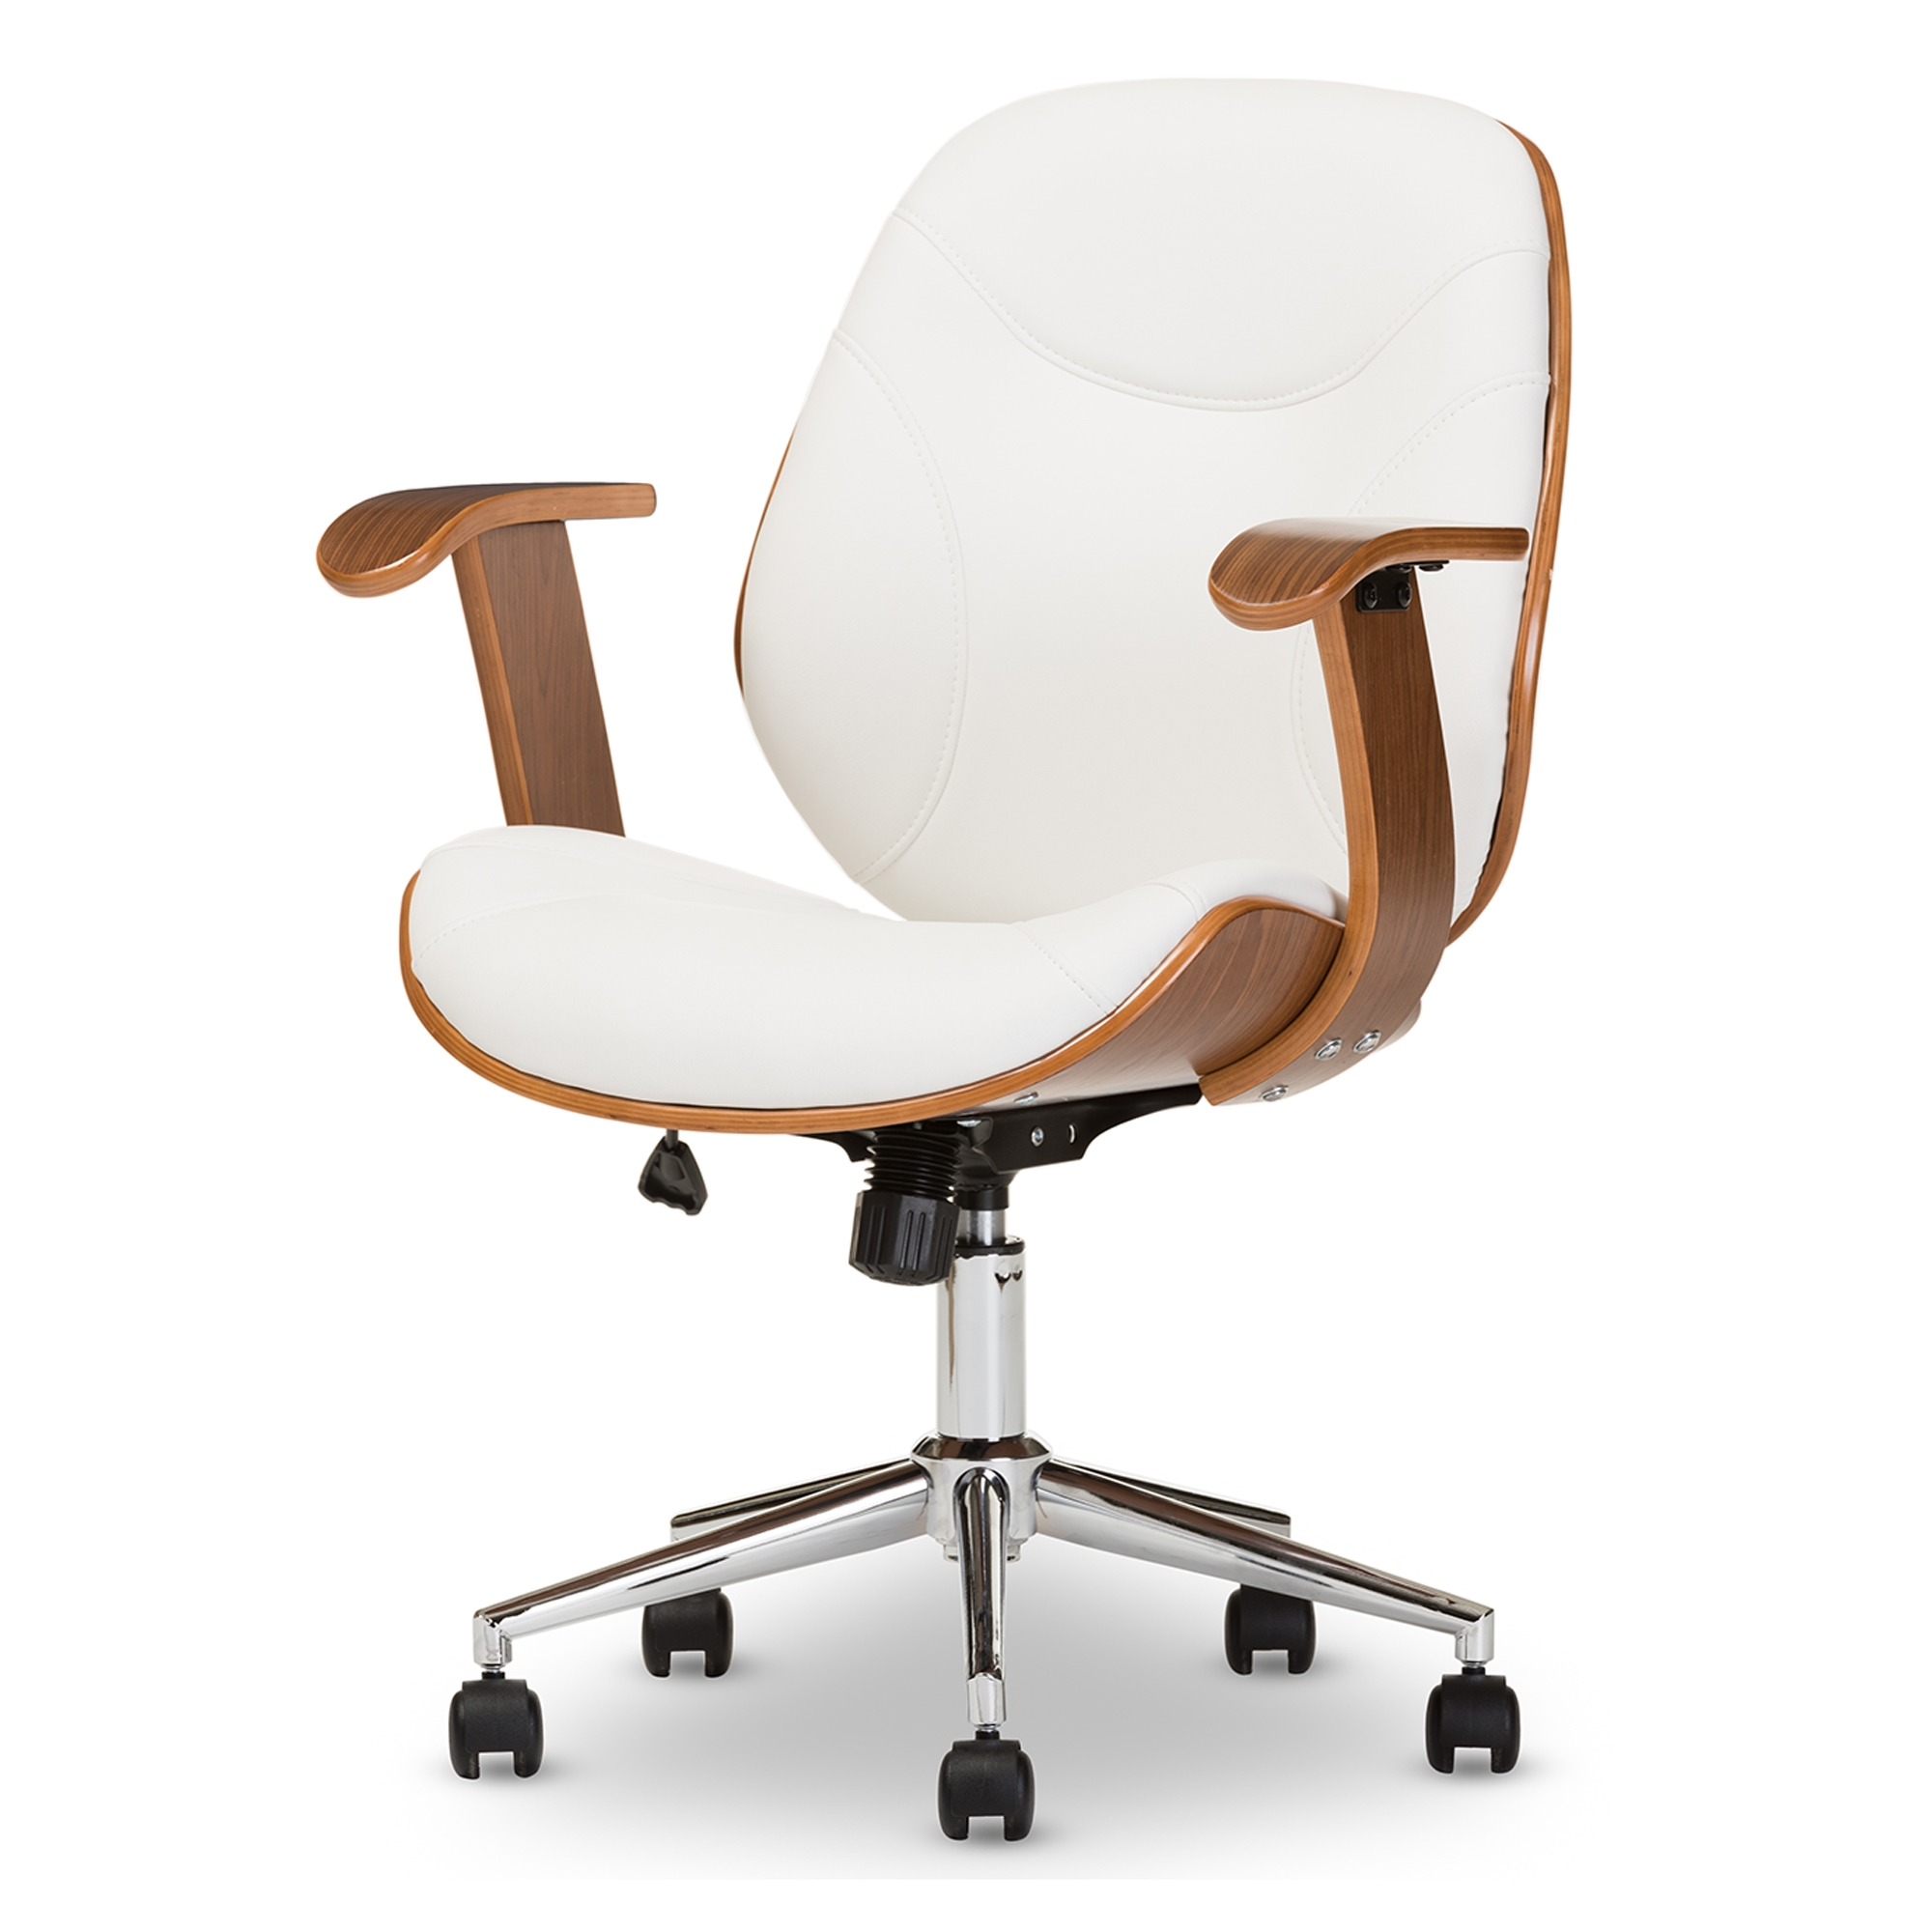 modern task chair. Baxton Studio Rathburn Modern And Contemporary White Walnut Office Chair - SD-2235- Task T